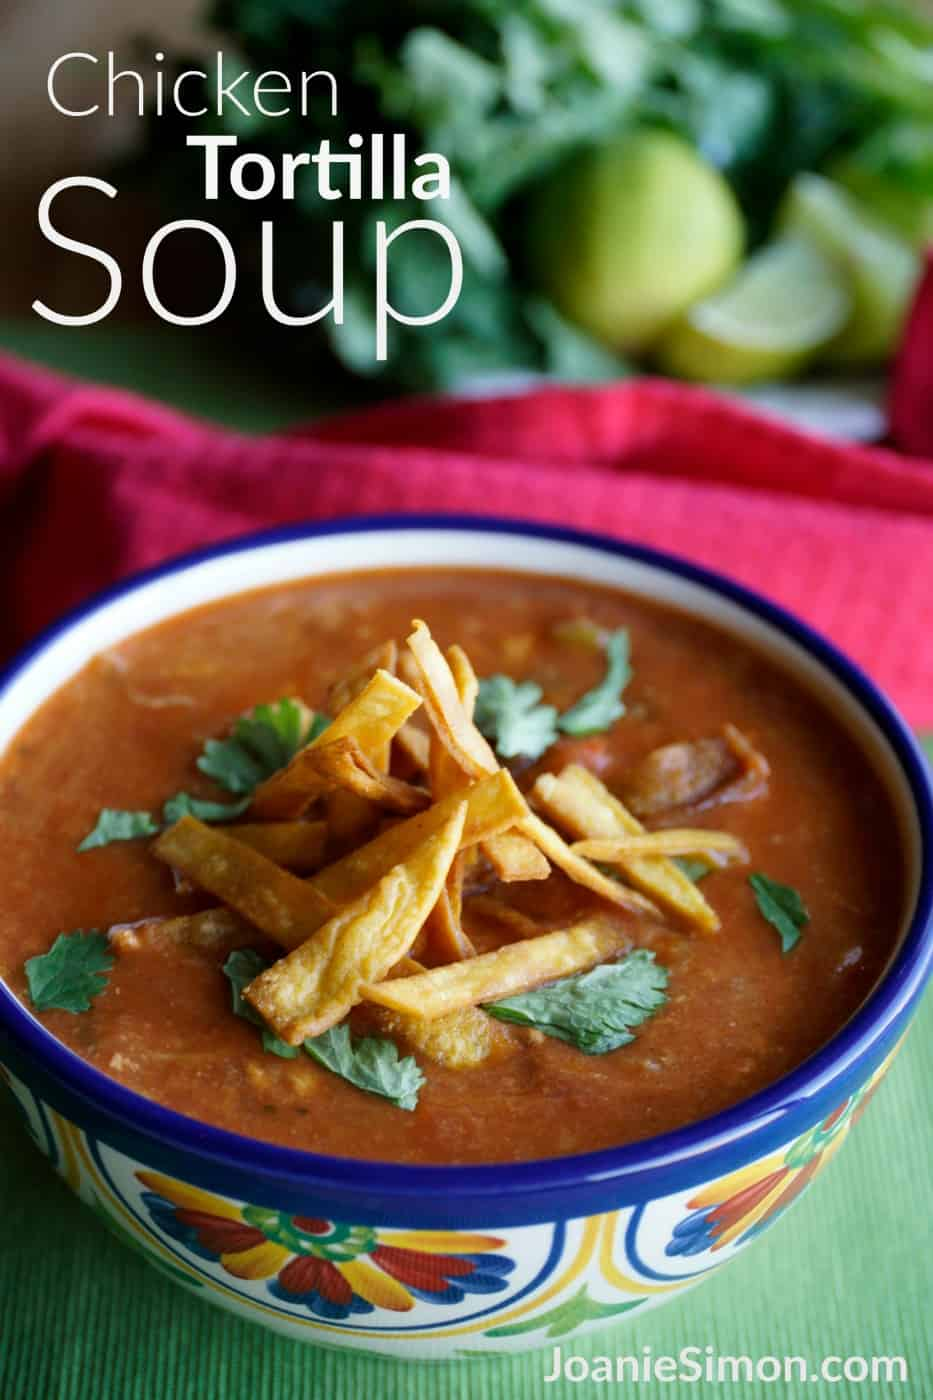 Chicken Tortilla Soup - JoanieSimon.com - an easy weeknight Crock-Pot slow cooker recipe